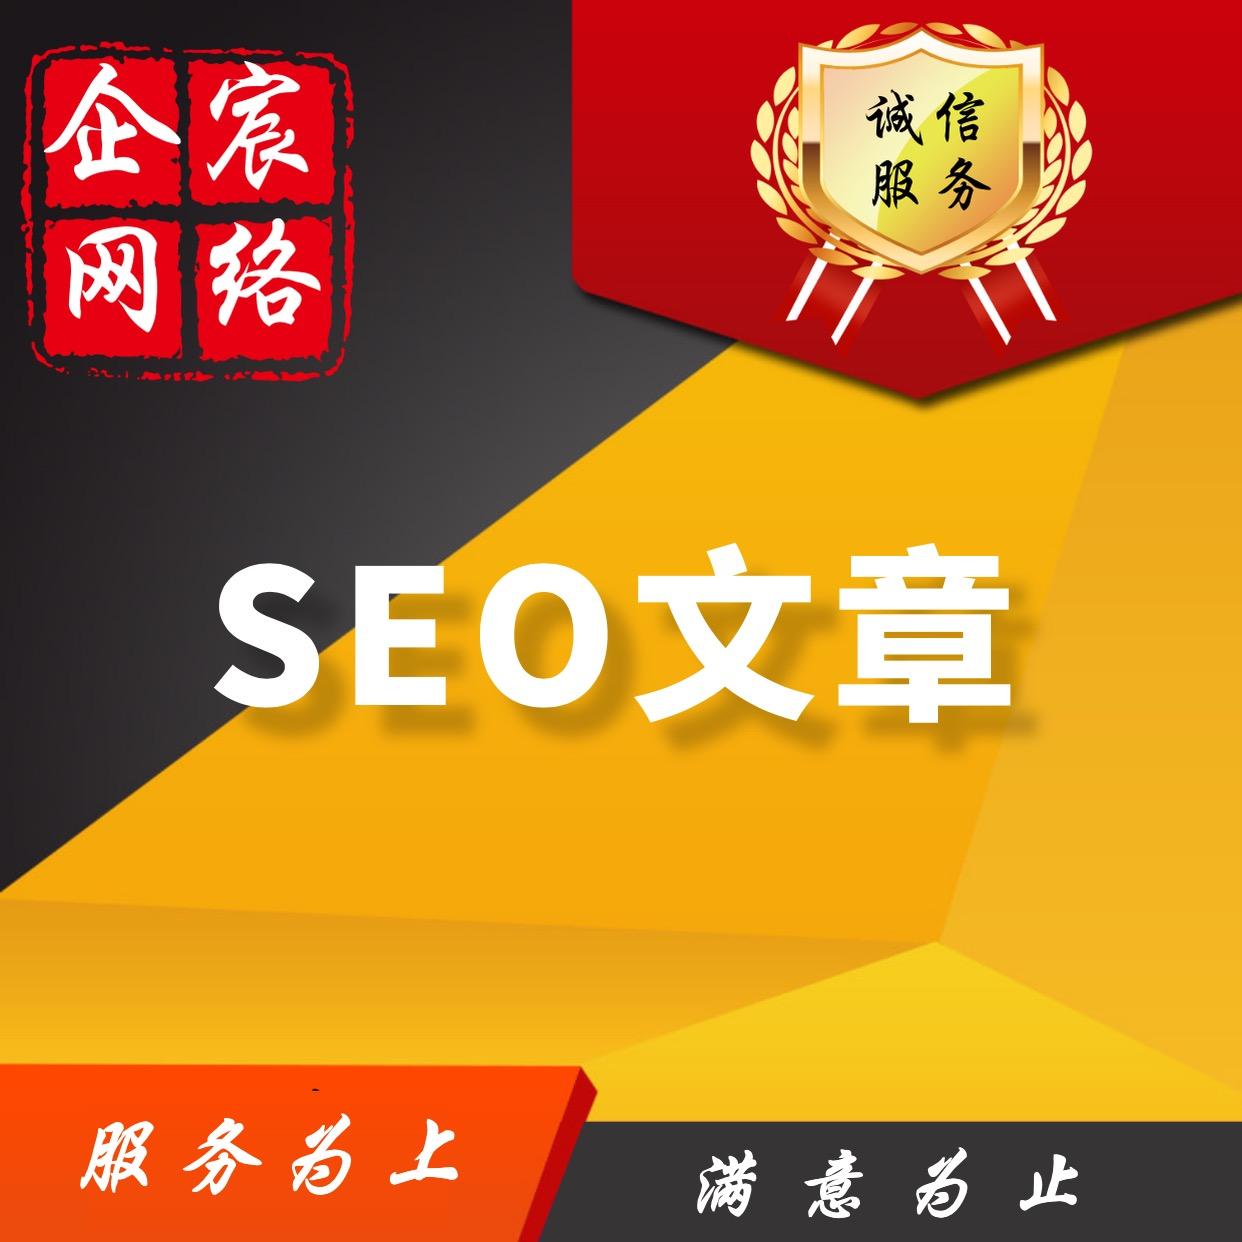 【SEO优化】友情链接/外链代发/seo文章撰写/优化套餐